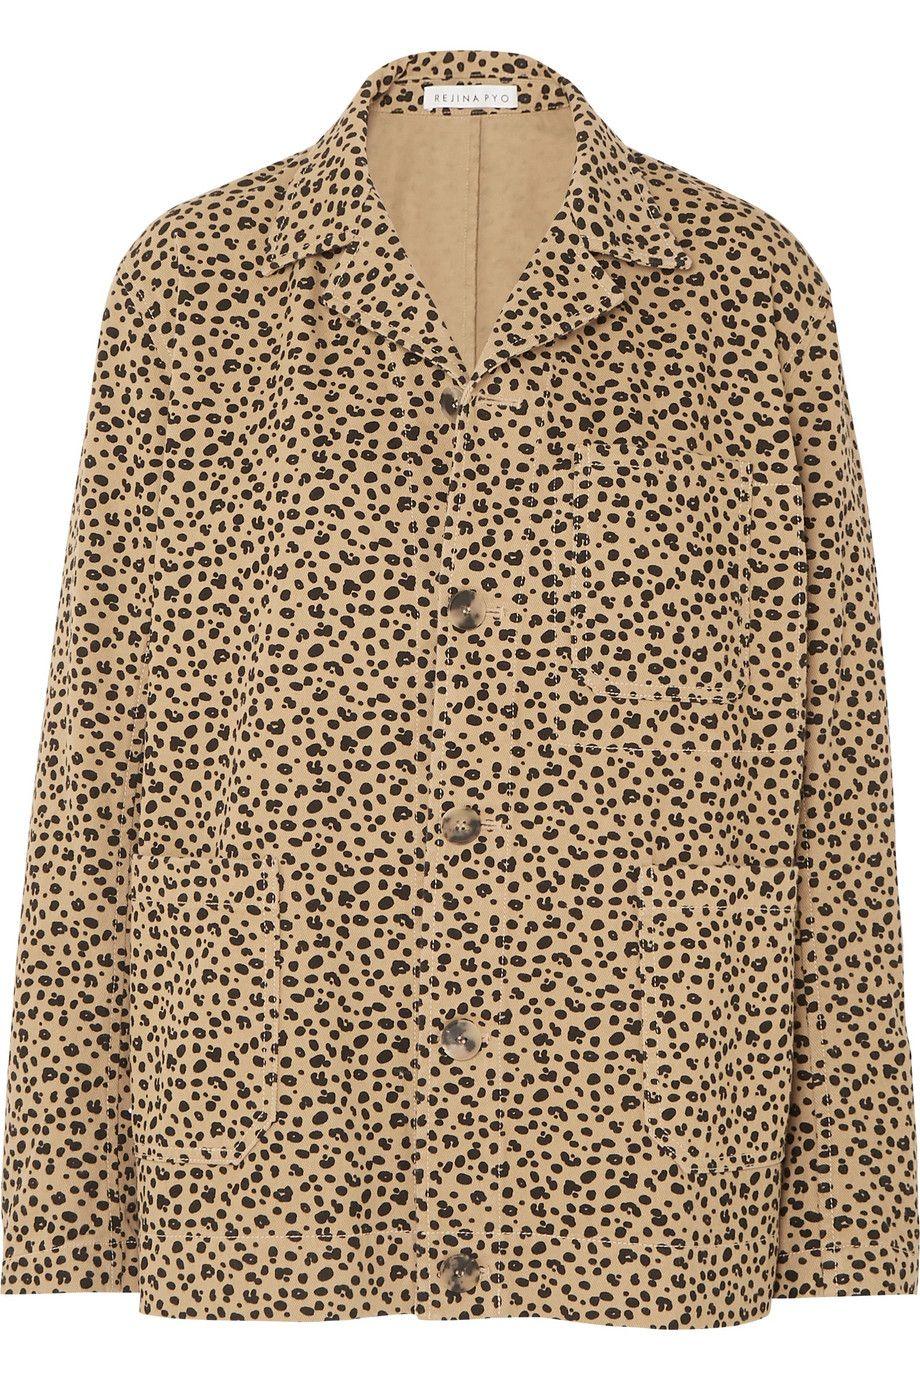 Billie Leopard-Print Cotton-Twill j=Jacket Rejina Pyo net-a-porter.com $650.00 SHOP NOW Swap out your denim jacket for a twill leopard version instead.